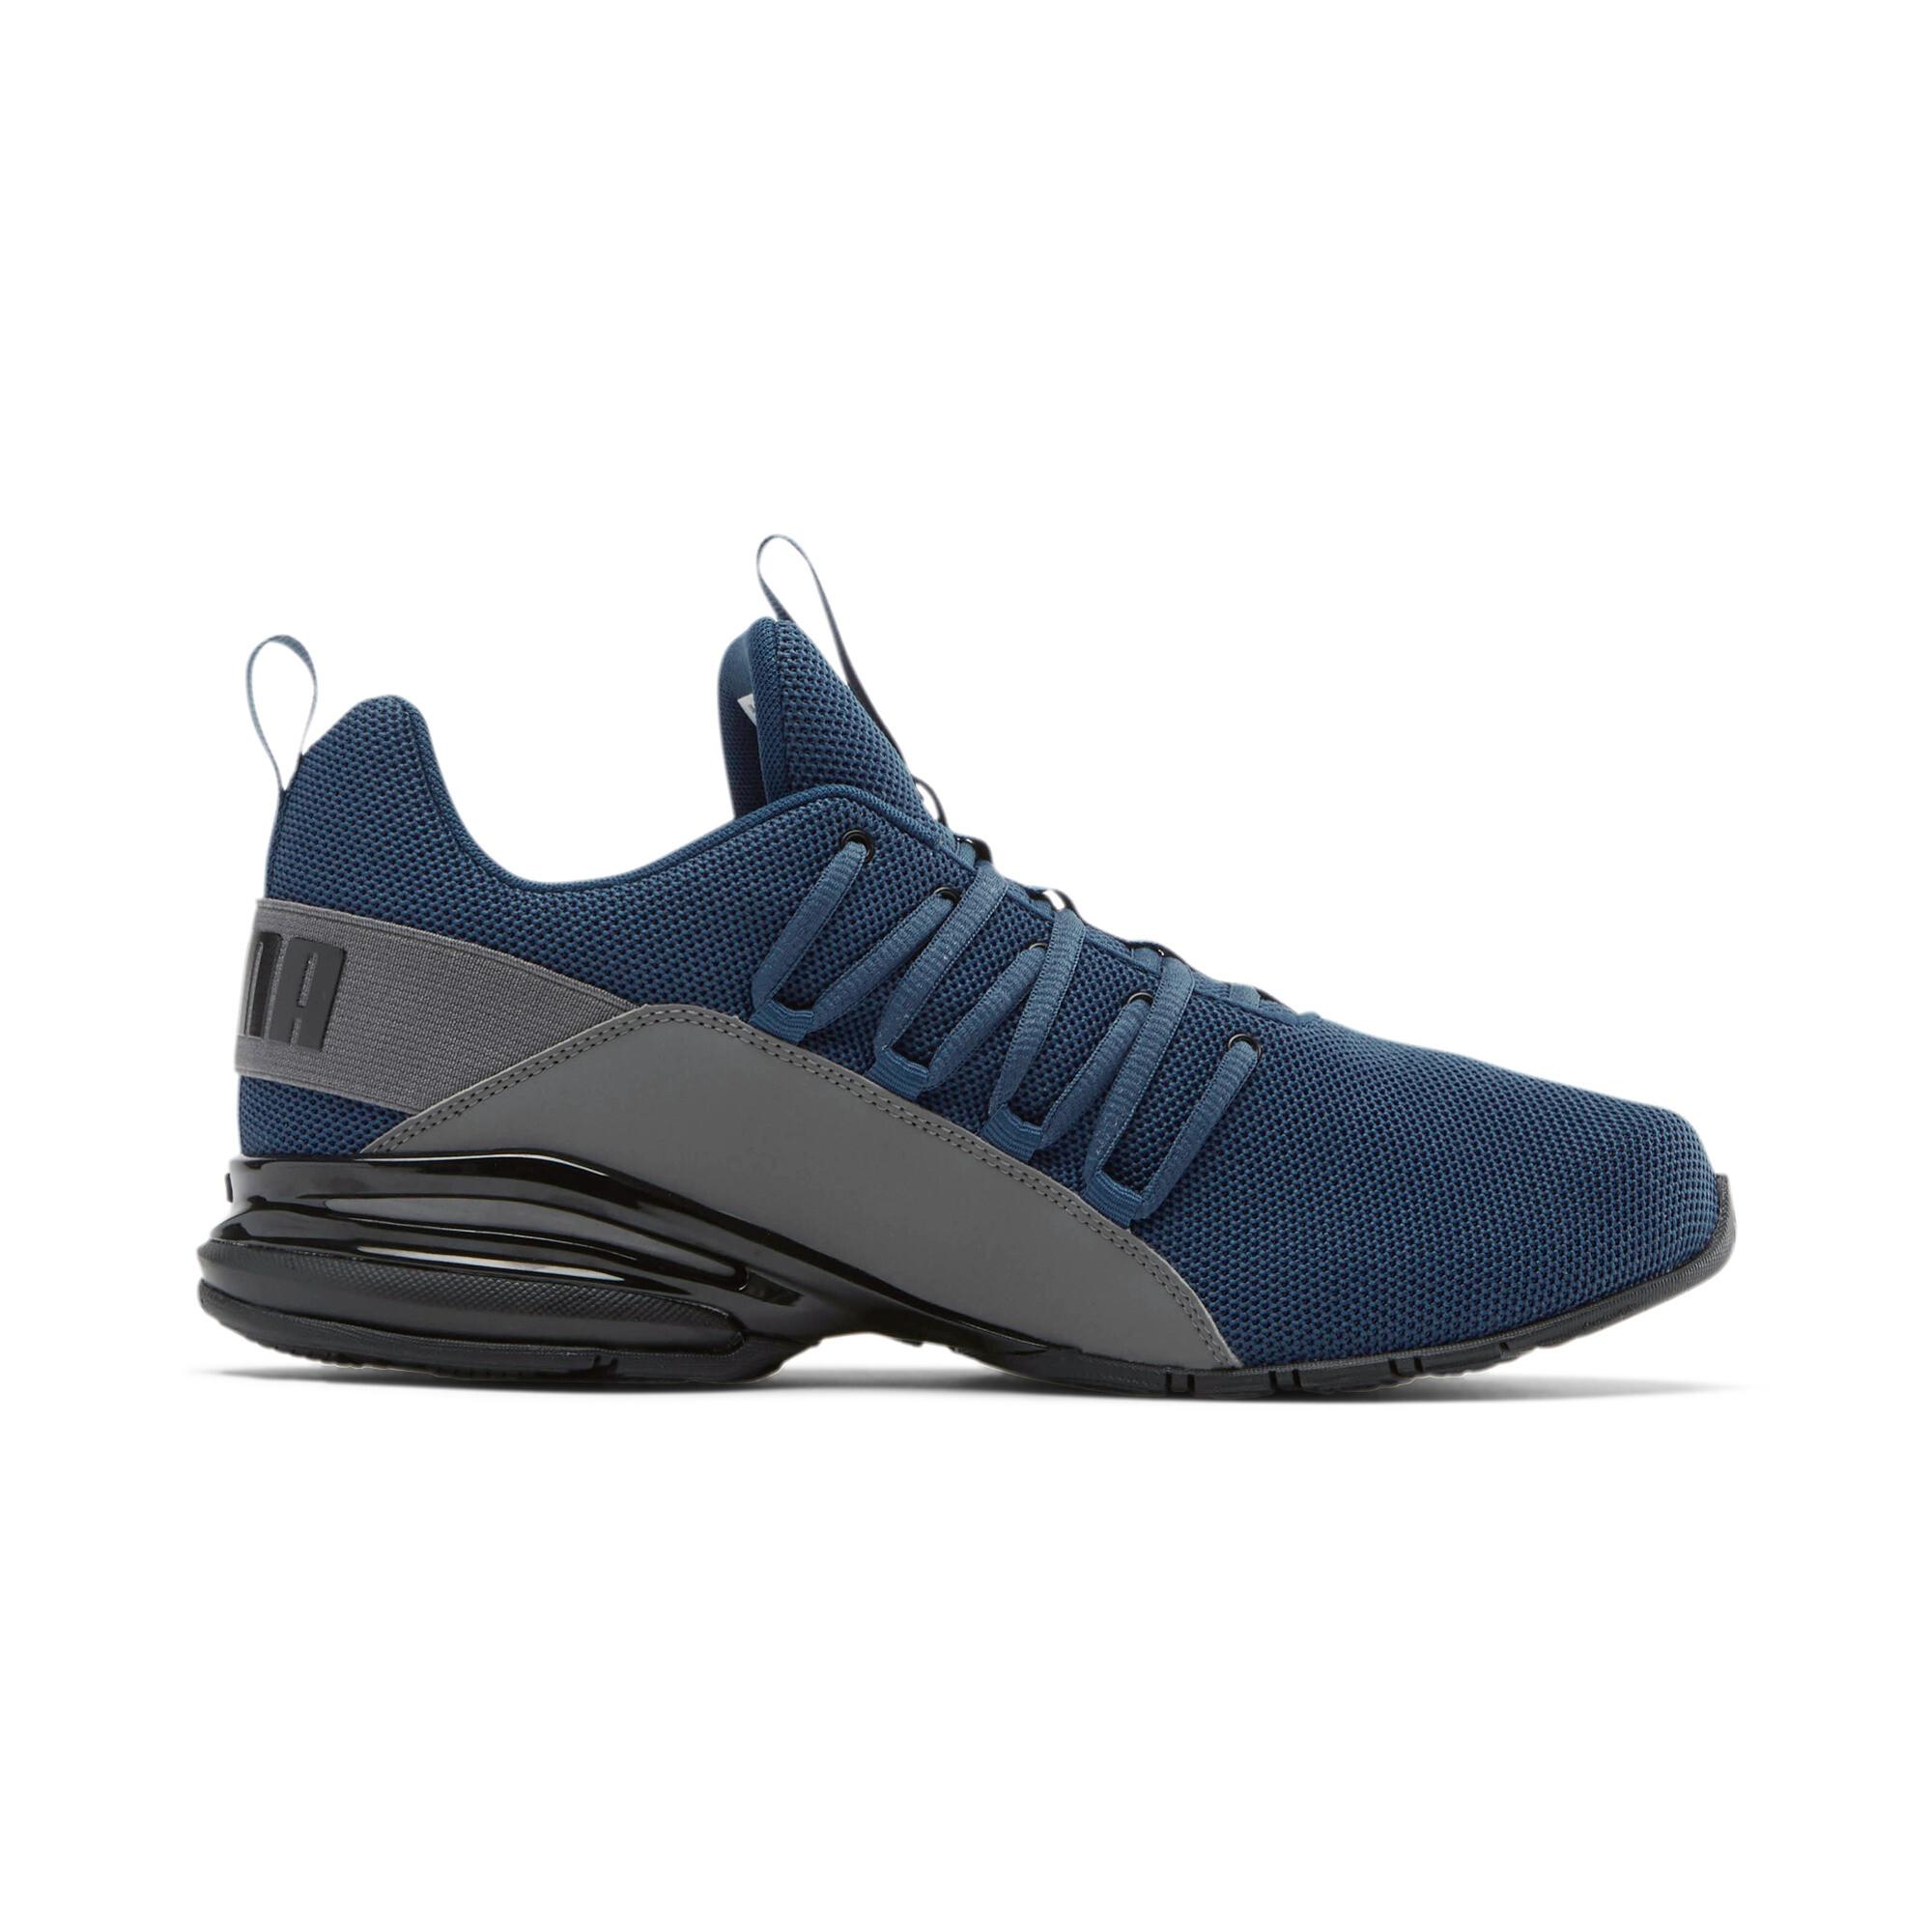 PUMA-Momenta-Men-039-s-Training-Shoes-Men-Shoe-Running thumbnail 24